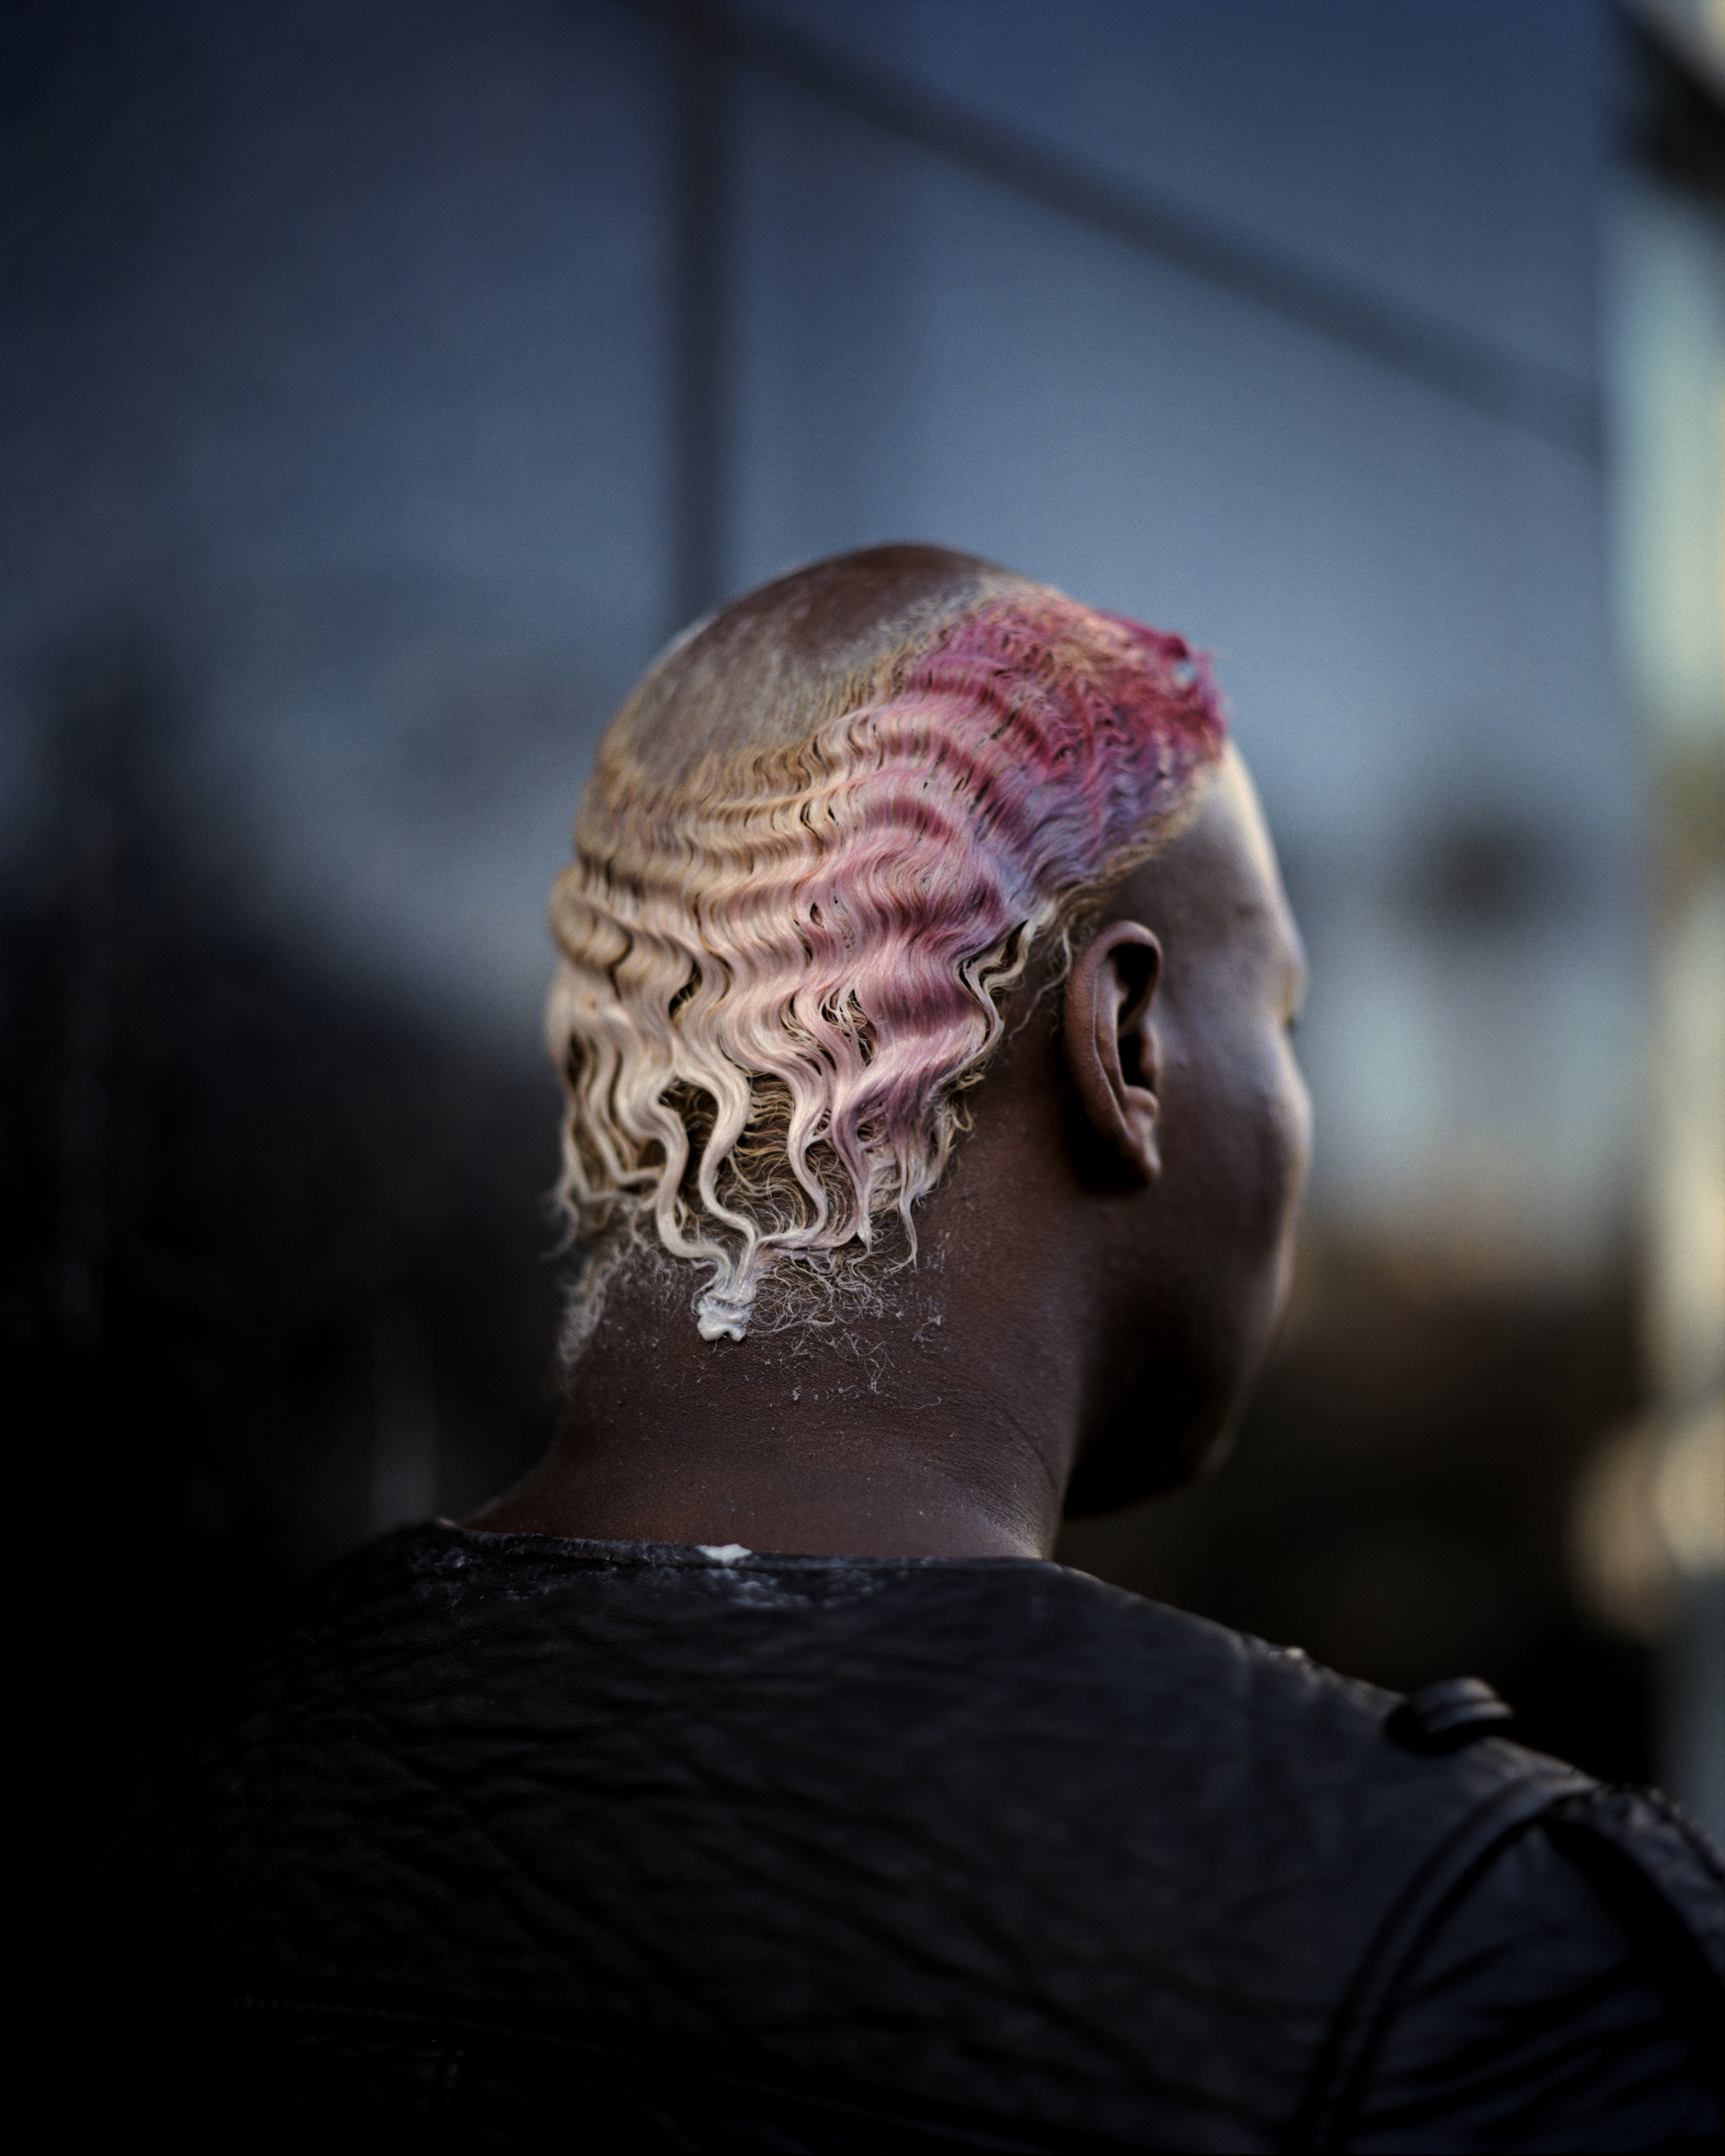 gregory halpern - Jake-Rainbow Hair-so it goes.jpg